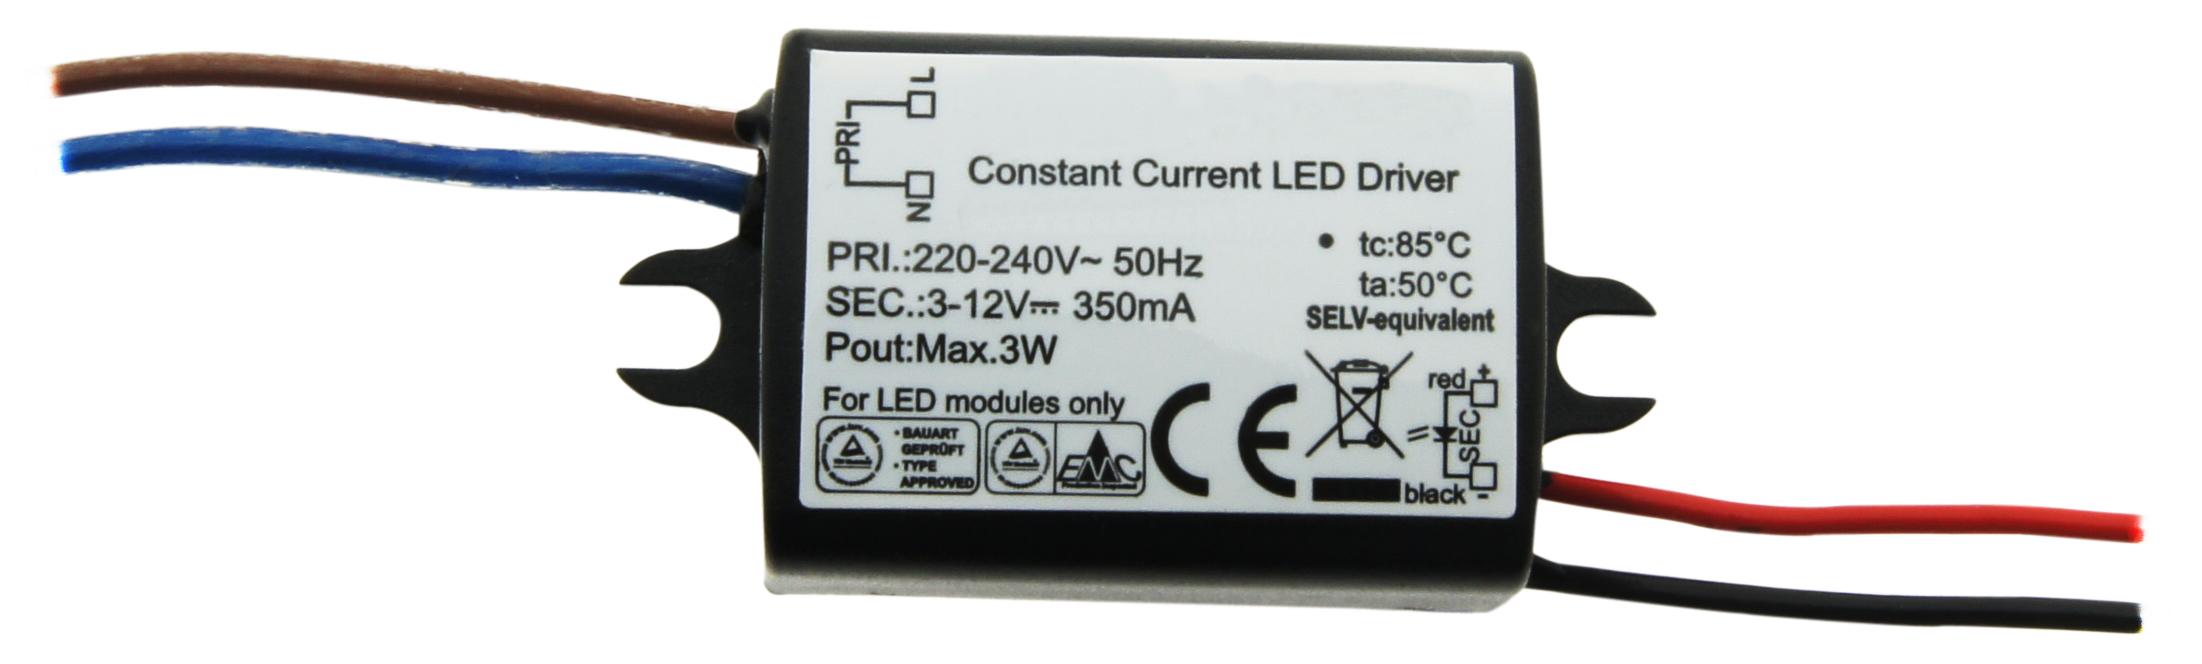 LED Netzteil HW 3W/700mA, IP65